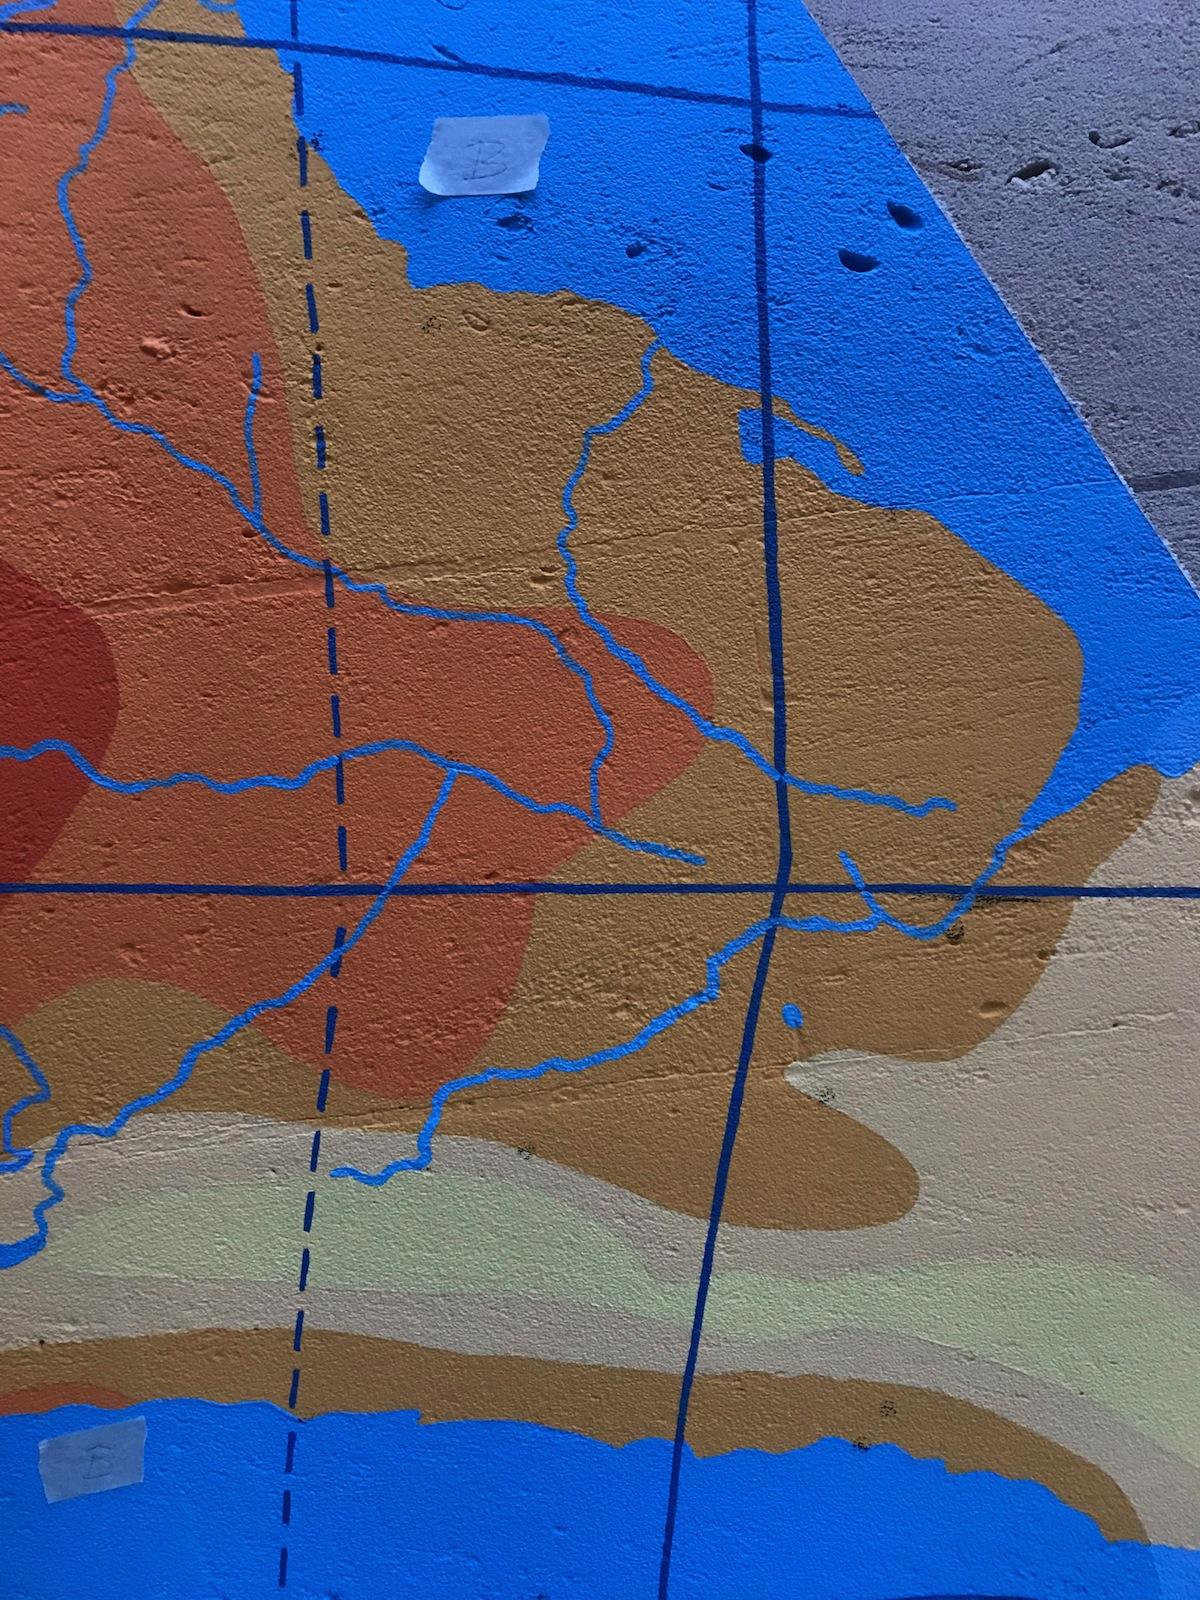 Buckminster_fuller_mural_dymaxion_map-06